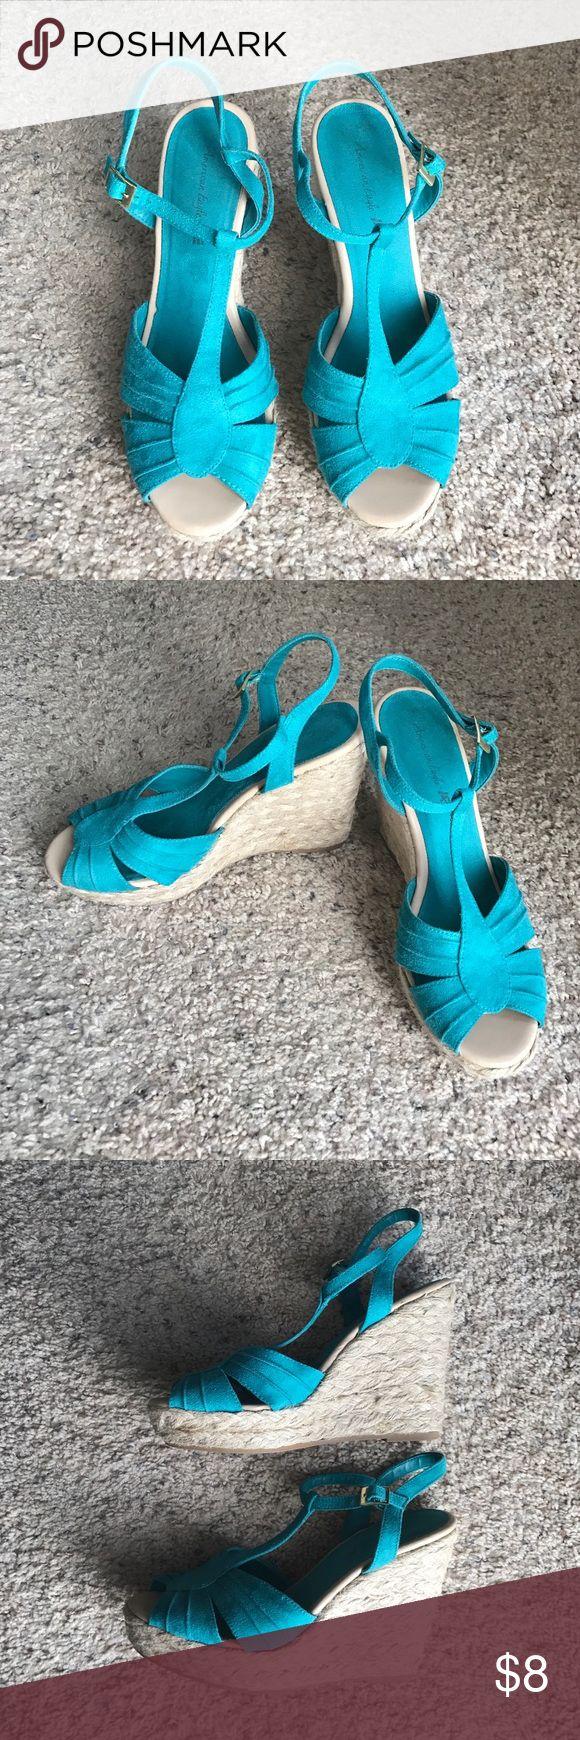 Teal Wedges by American Eagle Teal Wedges by American Eagle.  Size 10. American Eagle Outfitters Shoes Wedges